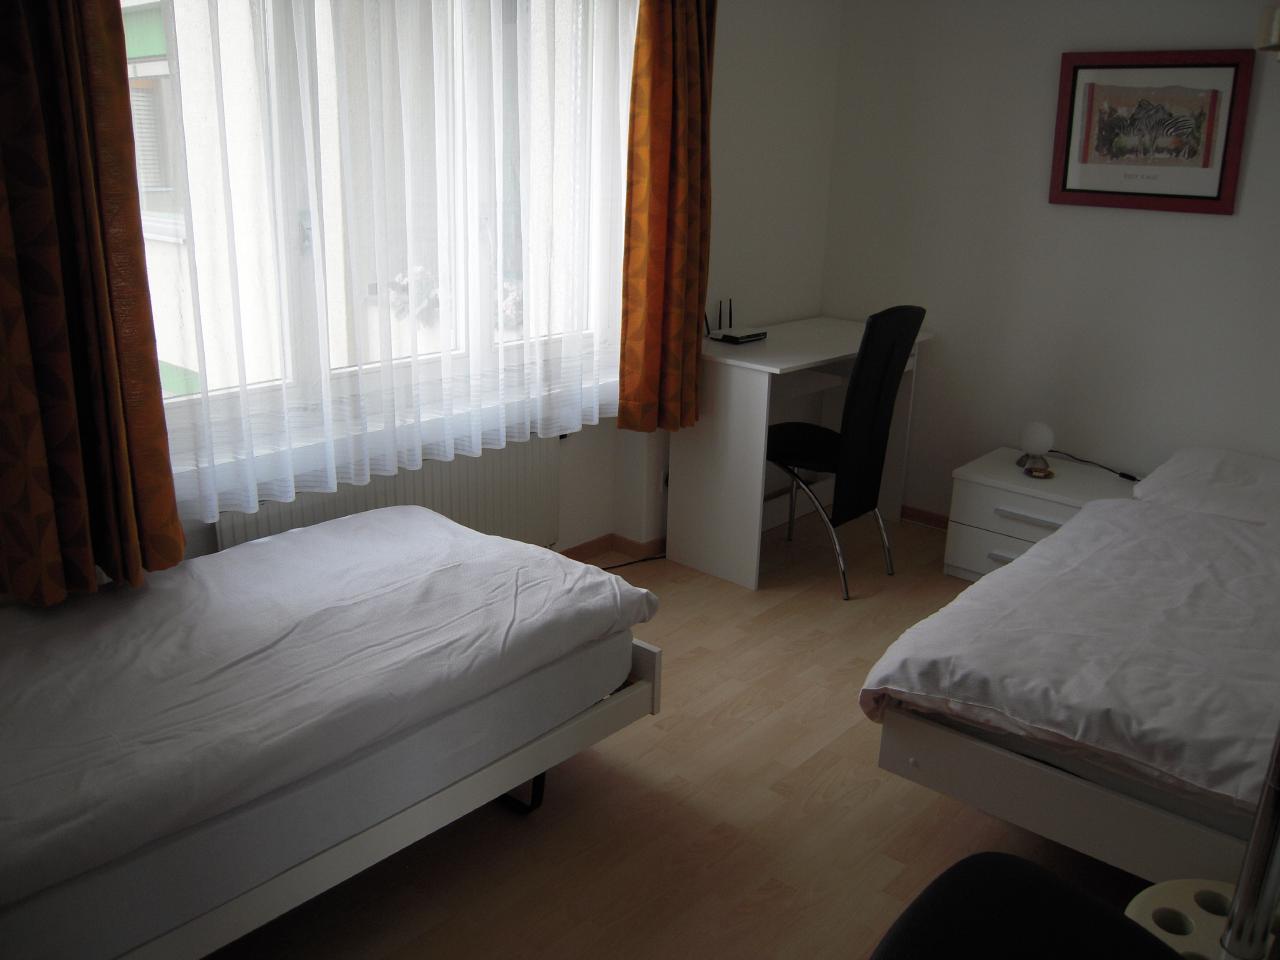 Holiday apartment Appartement Alpenblick / F5 (420340), Weggis, Weggis - Vitznau - Rigi, Central Switzerland, Switzerland, picture 6